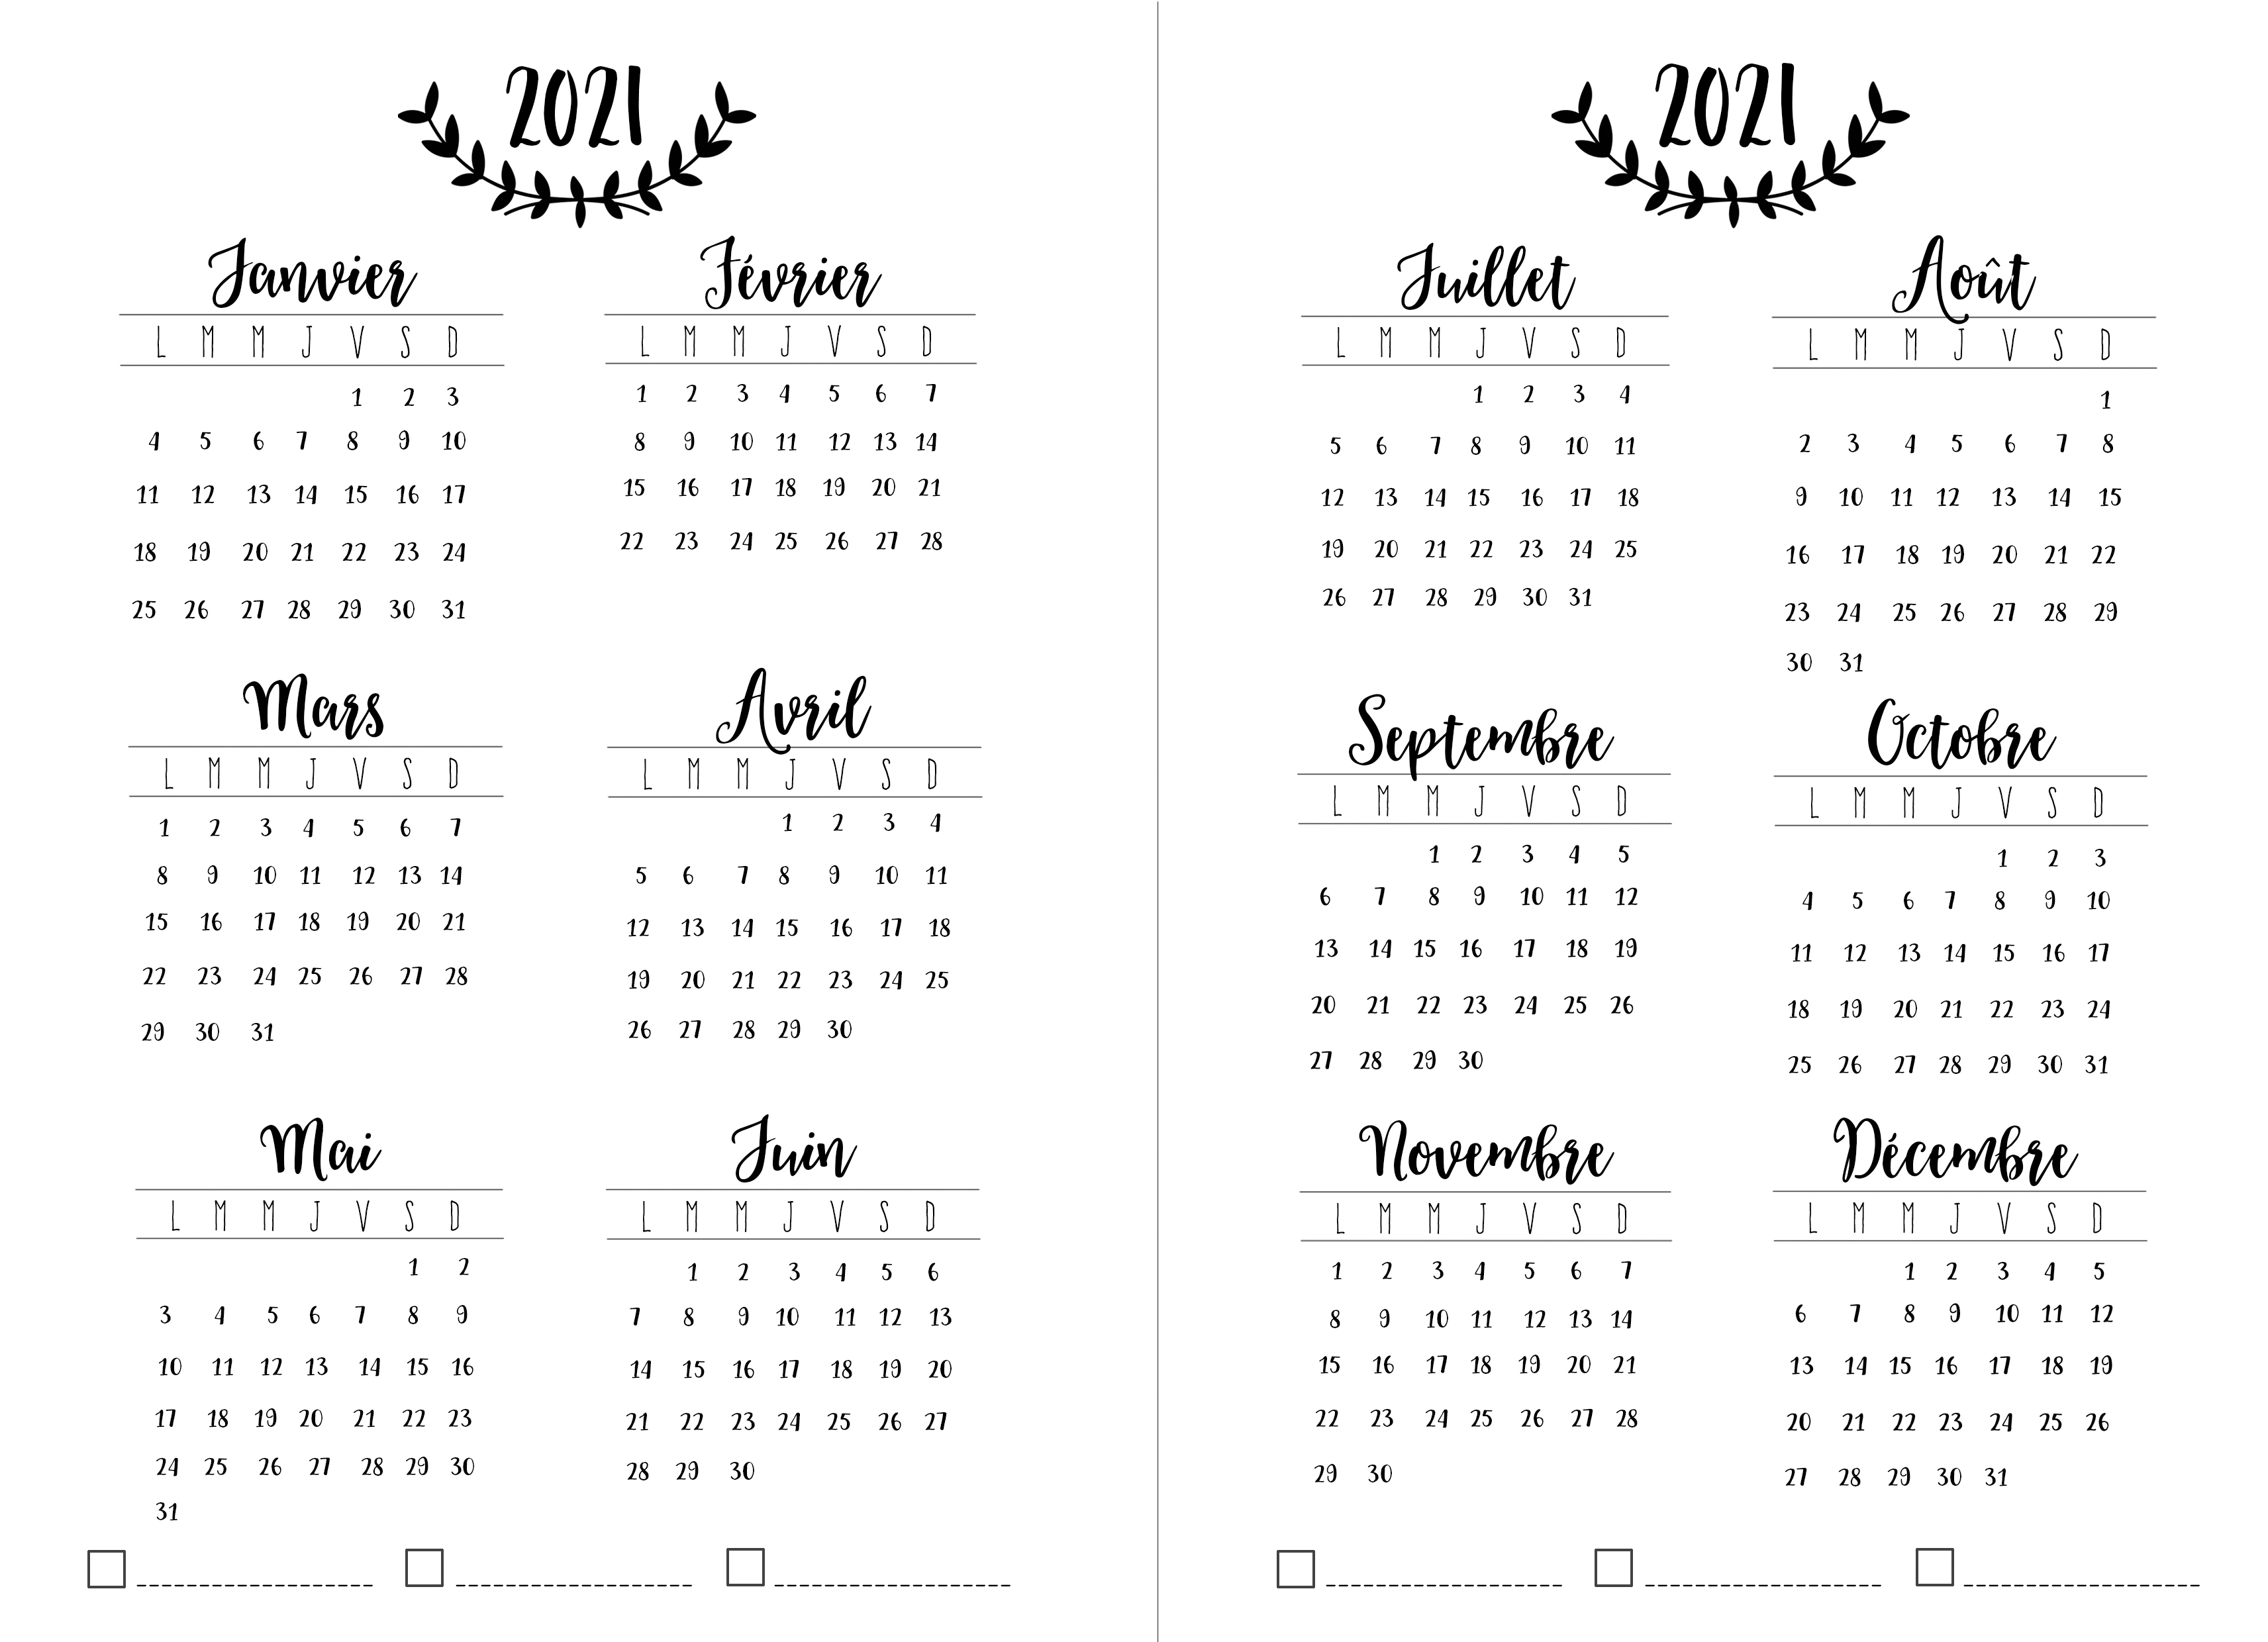 Calendrier 2021 Bujo Mon agenda façon bullet journal   Couturaddict